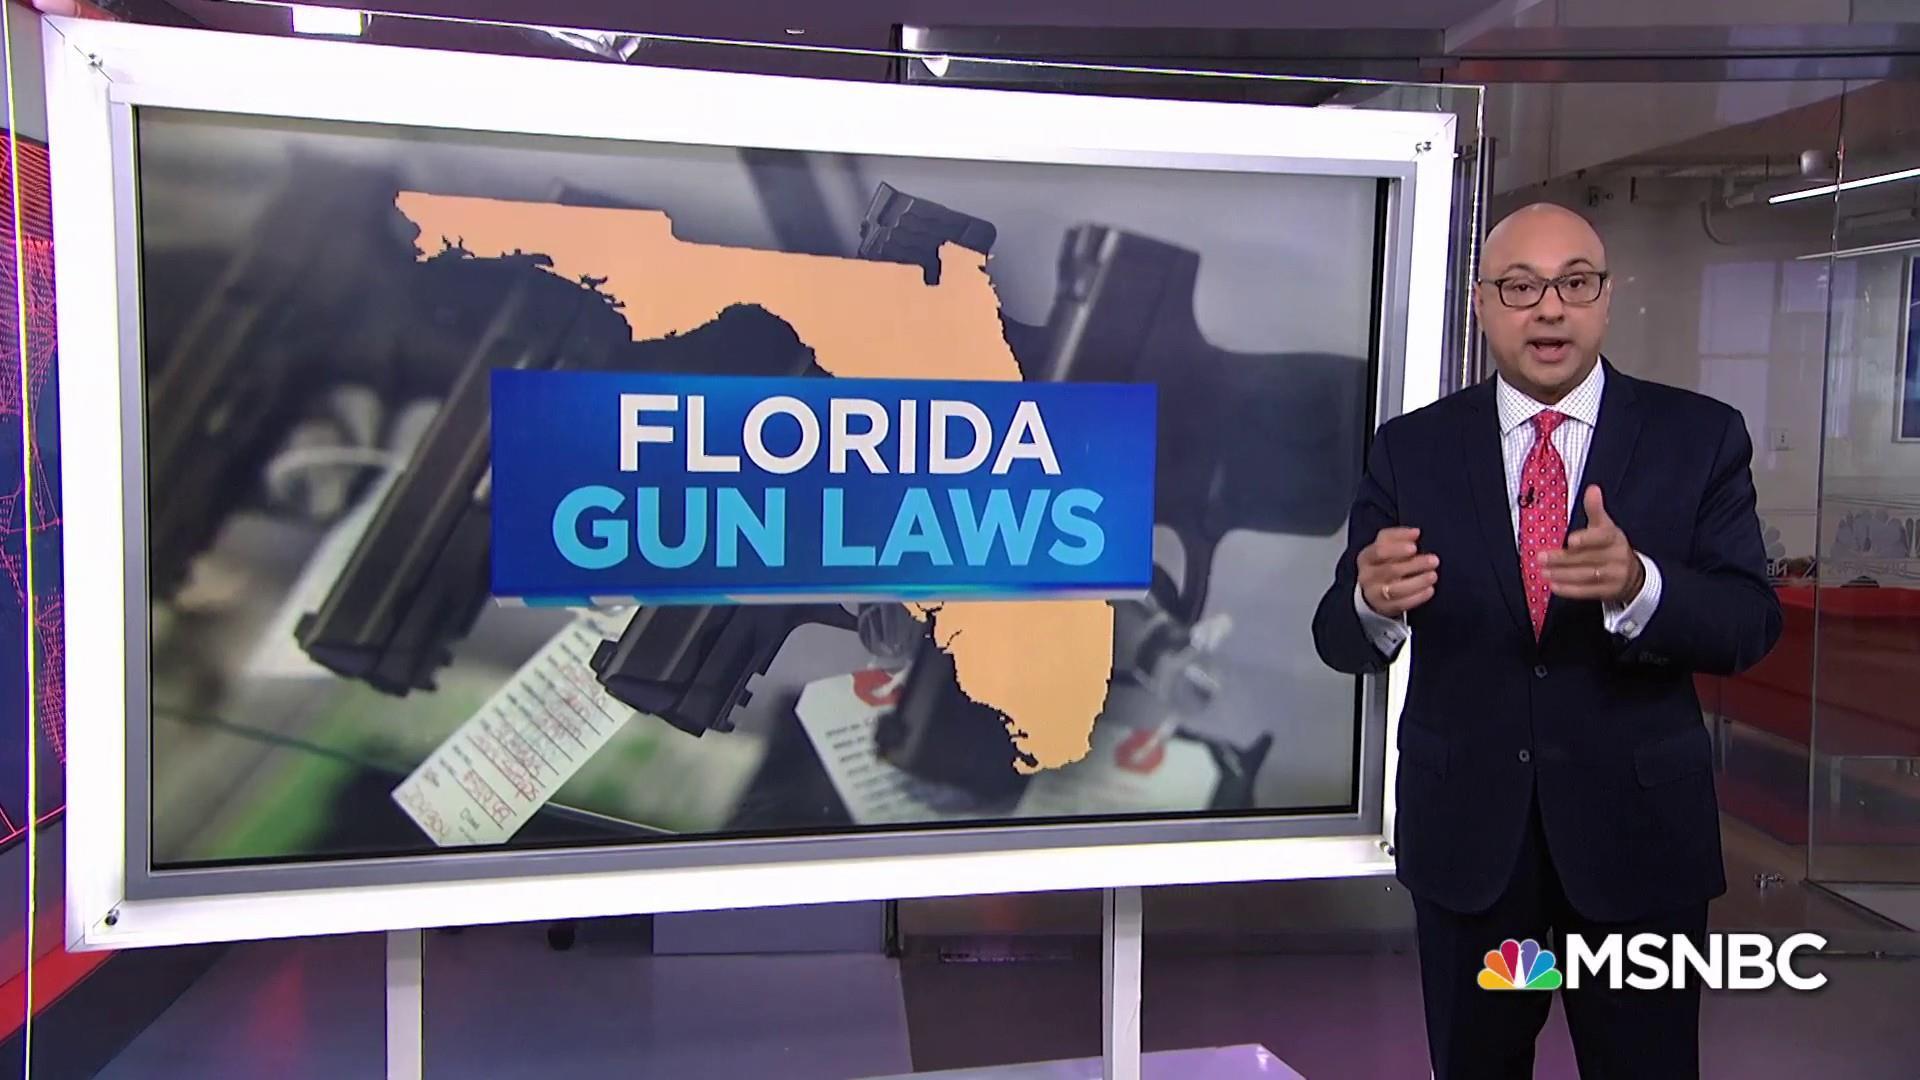 Analyzing Florida's gun laws following the Jacksonville shooting